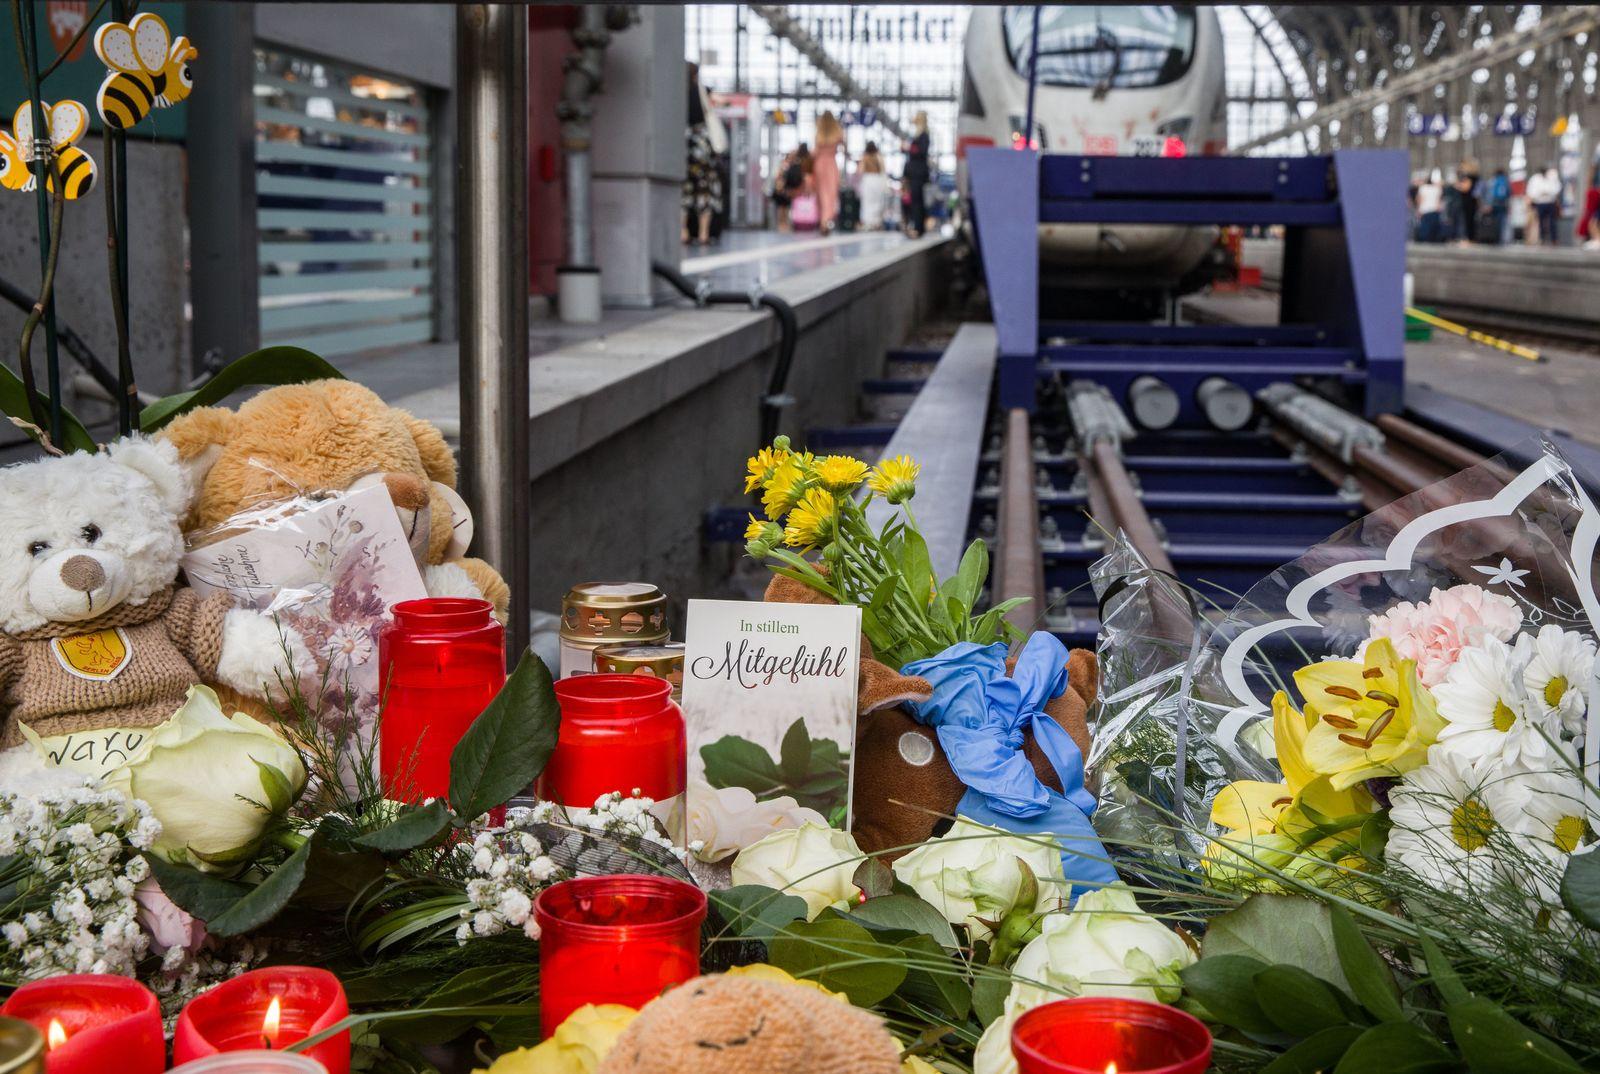 Attacke im Frankfurter Hauptbahnhof / Kerzen